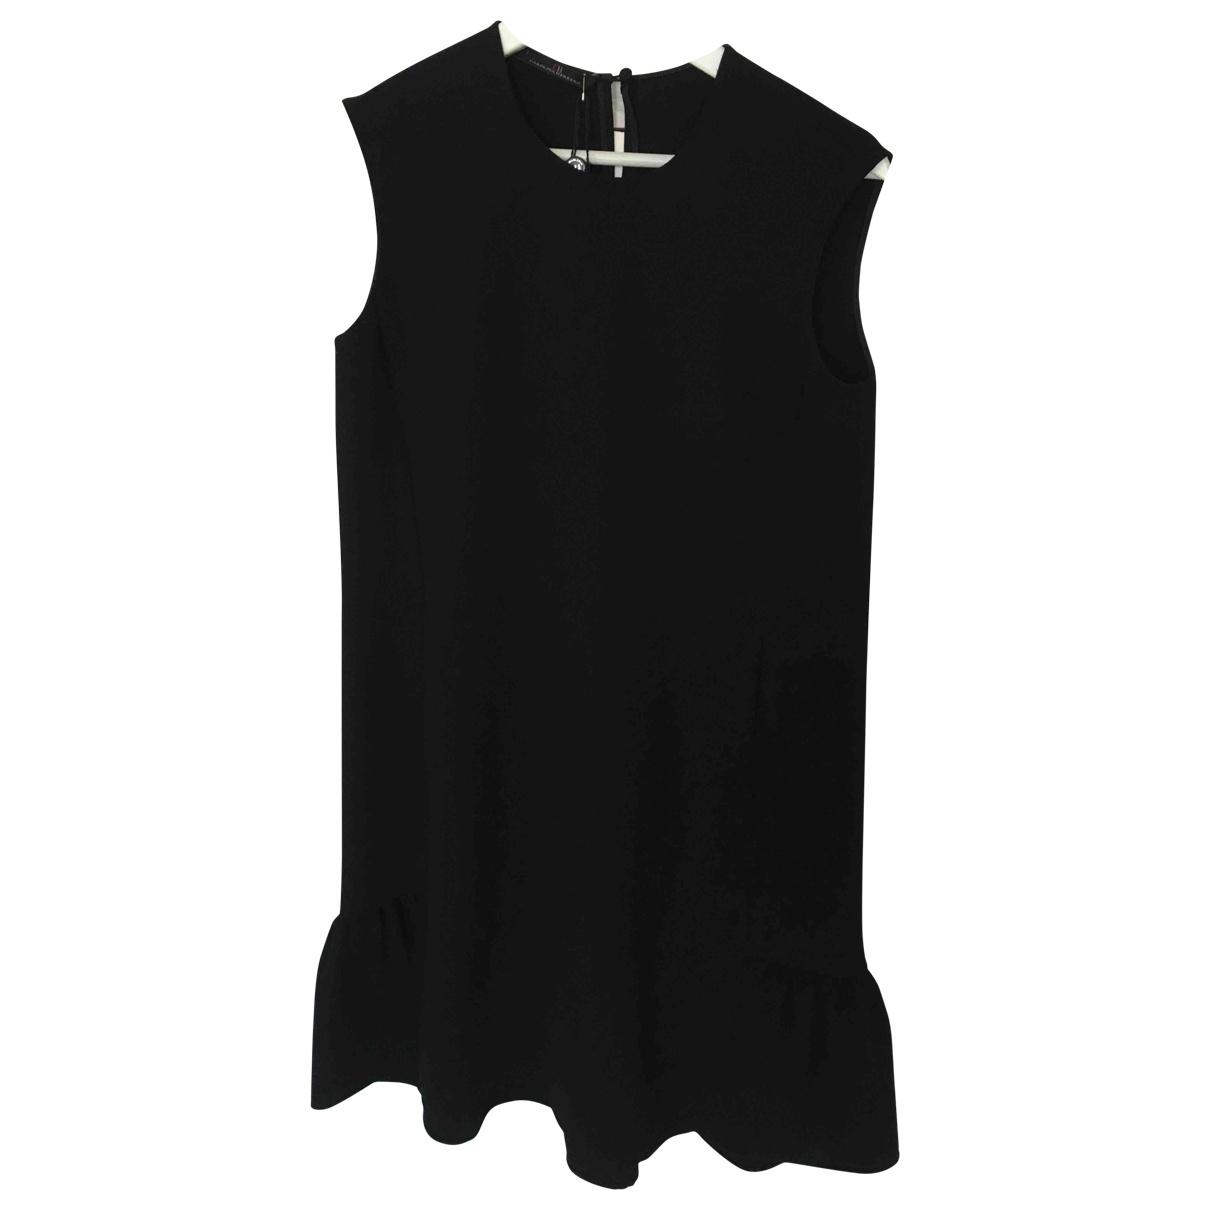 Carolina Herrera \N Kleid in  Schwarz Polyester